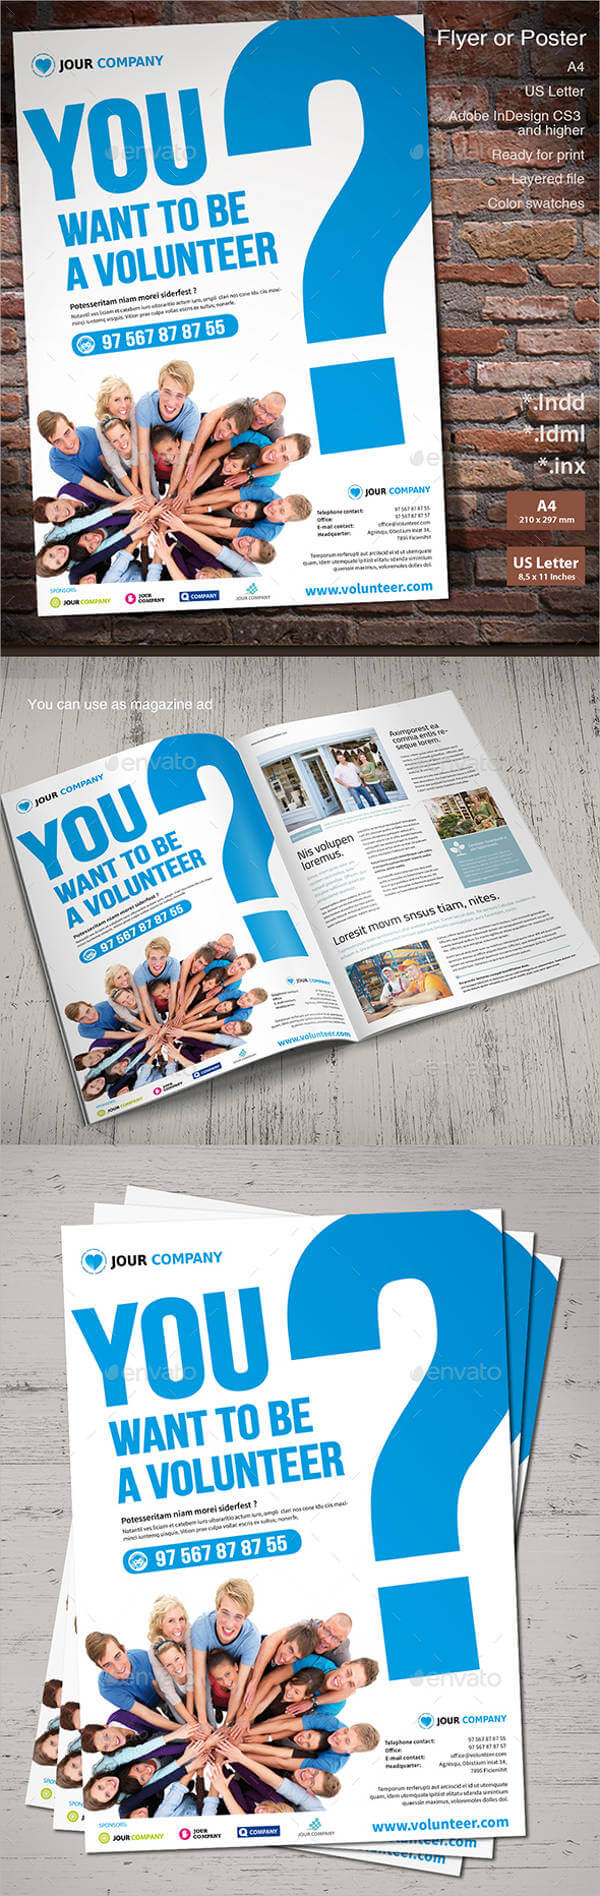 11+ Volunteer Flyers - Ms Word, Pages, Psd, Vector Eps within Volunteer Brochure Template